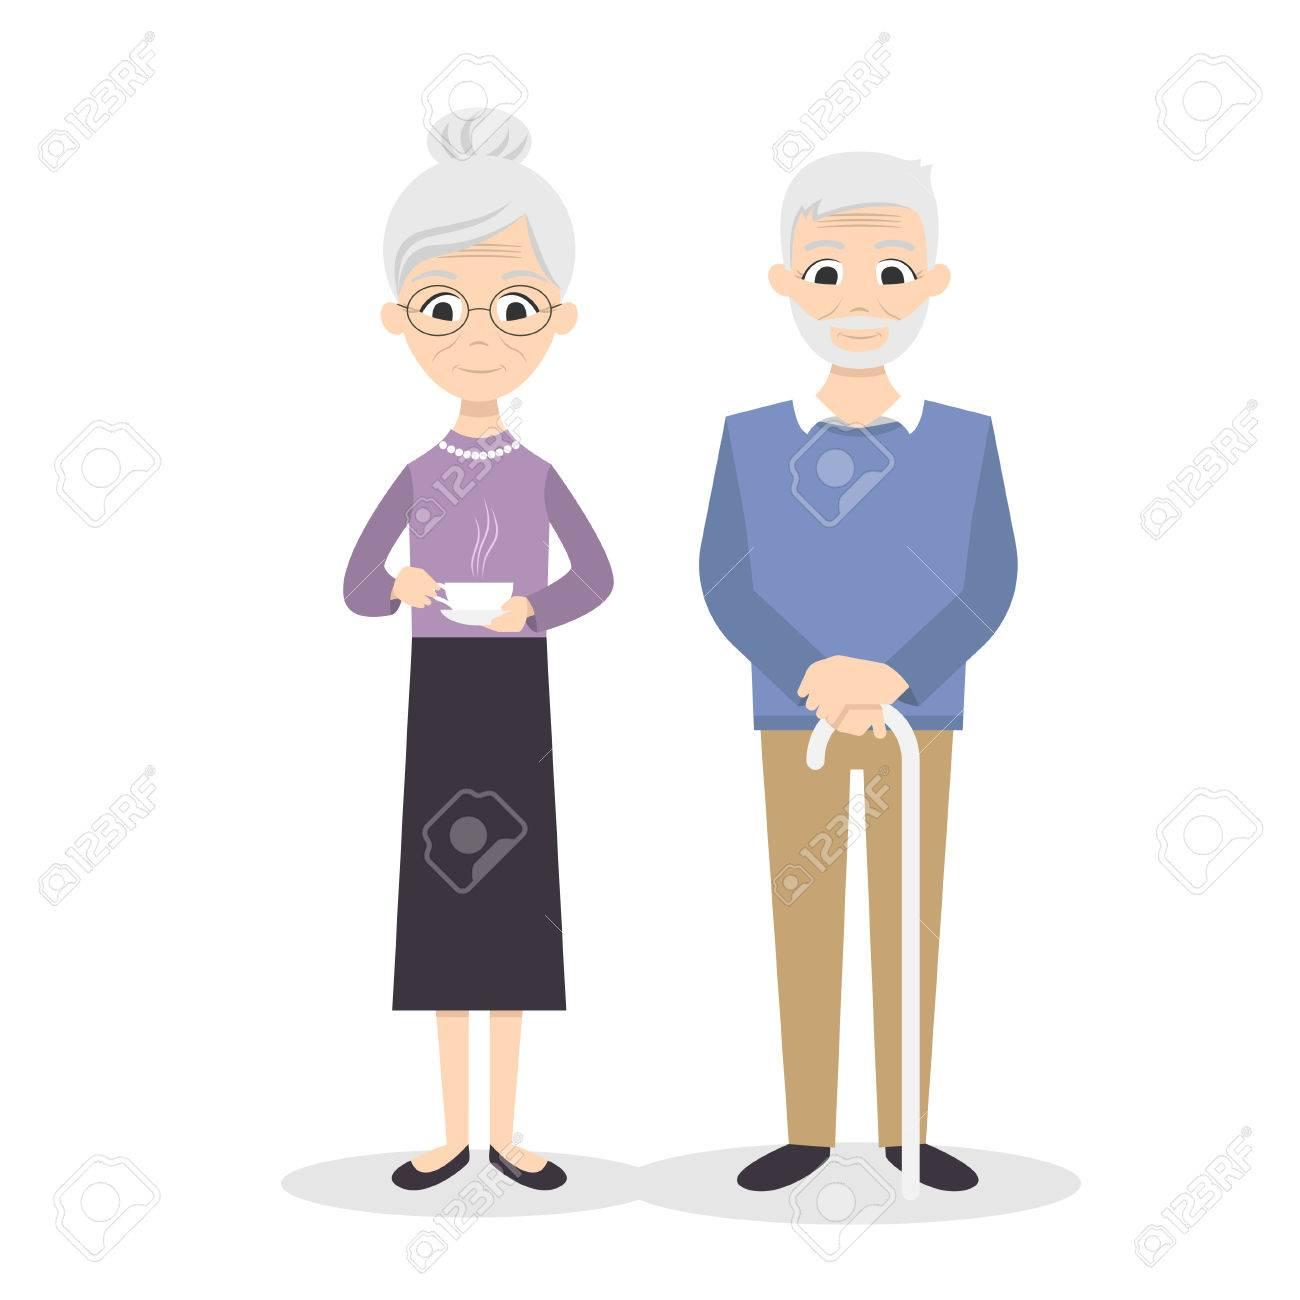 Vector illustration of happy smiling senior couple. - 51420522